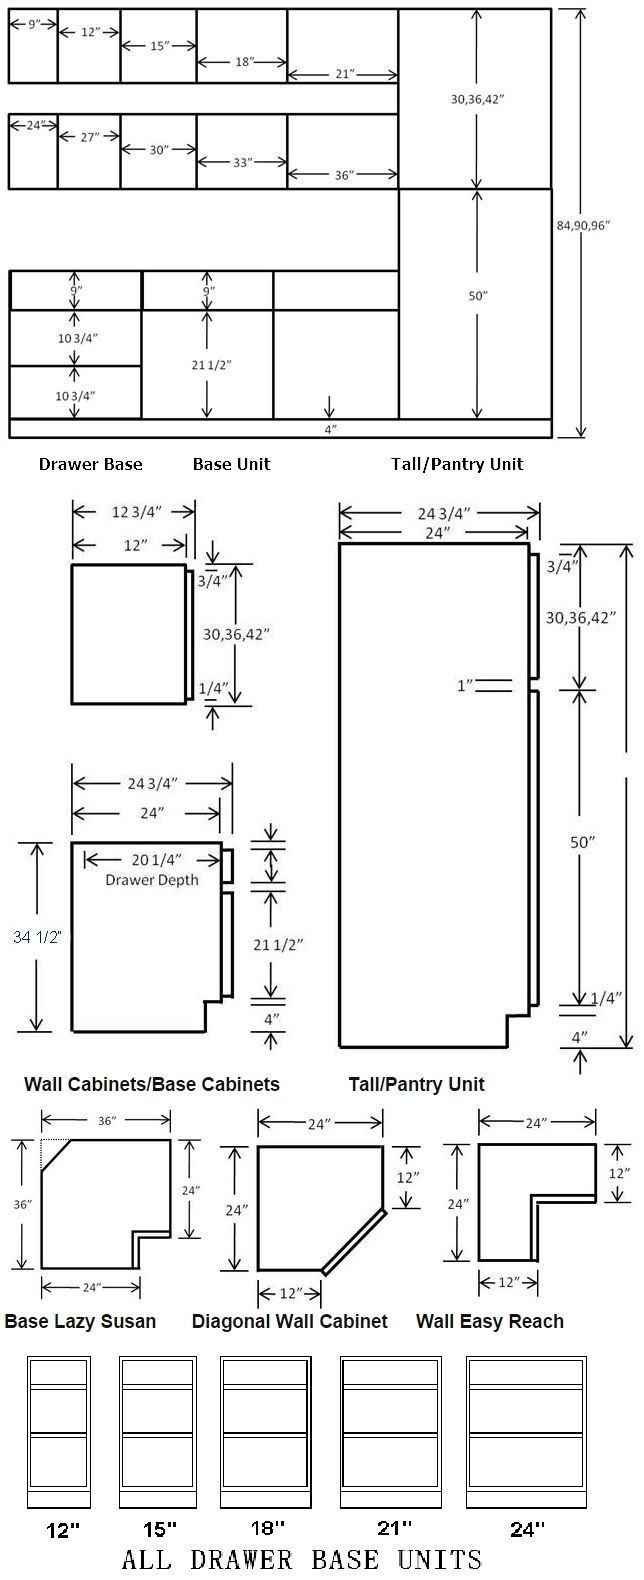 medium resolution of 17th edition kitchen wiring diagram